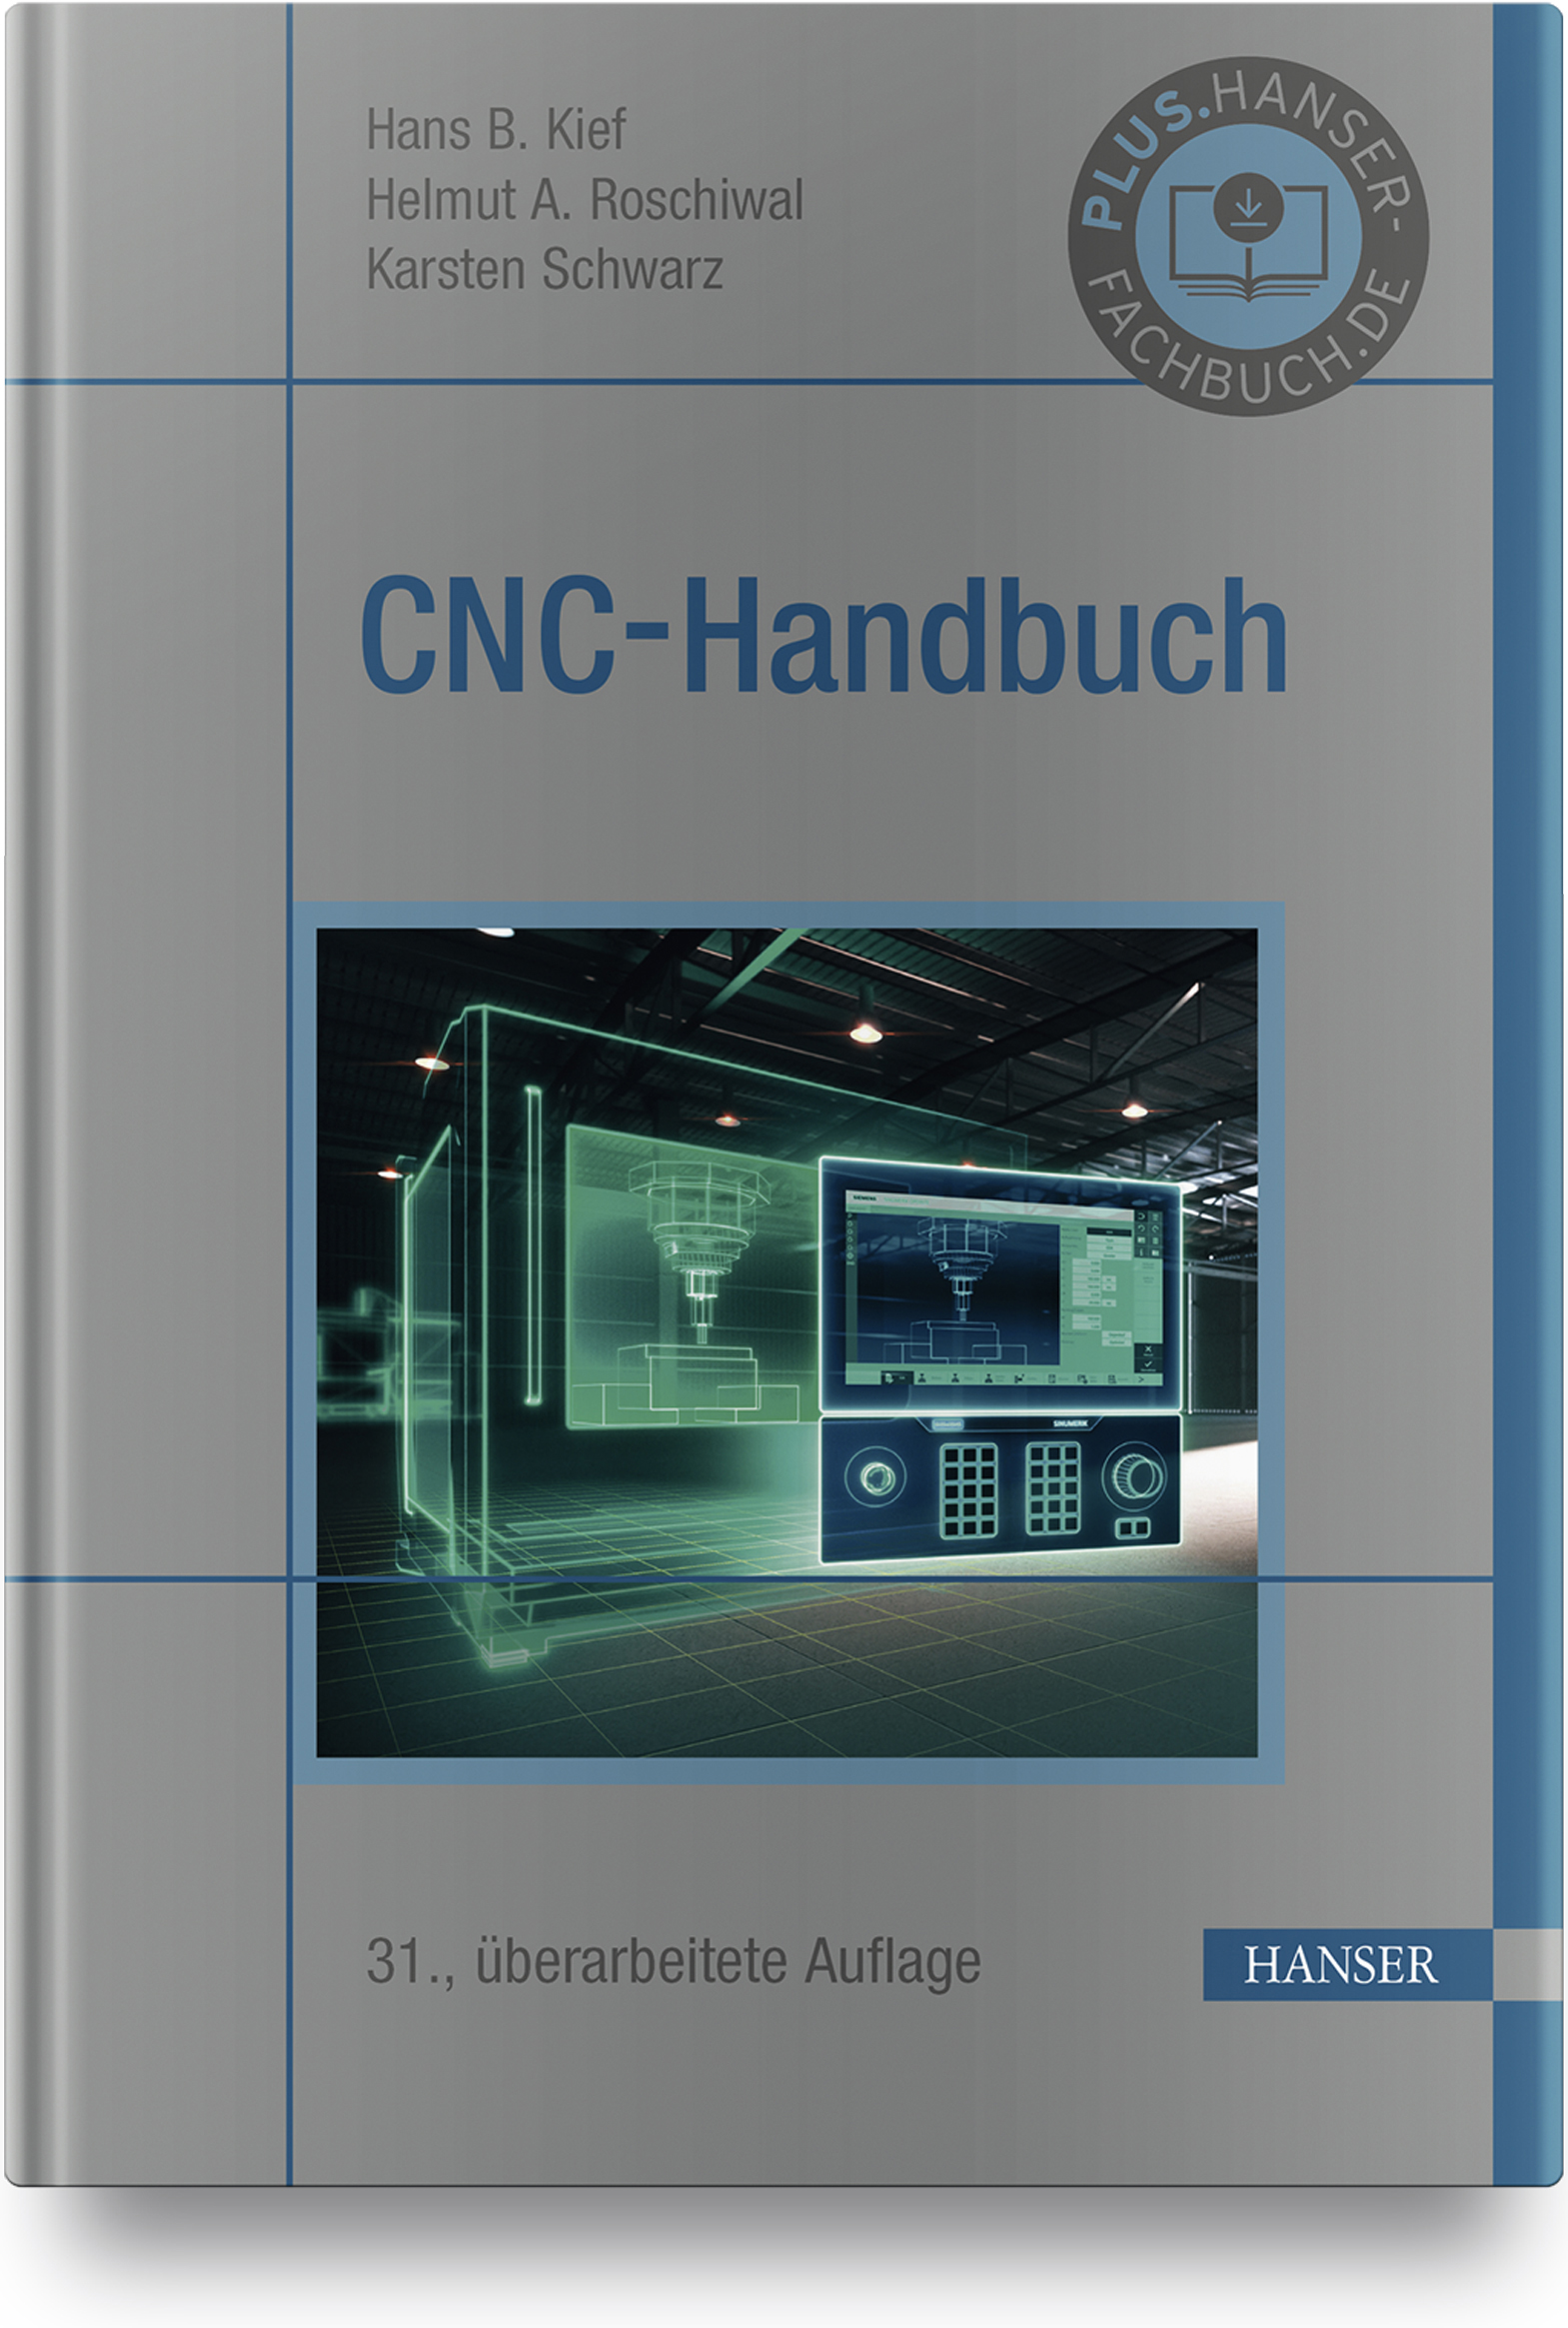 Kief, Roschiwal, Schwarz, CNC-Handbuch, 978-3-446-45877-2